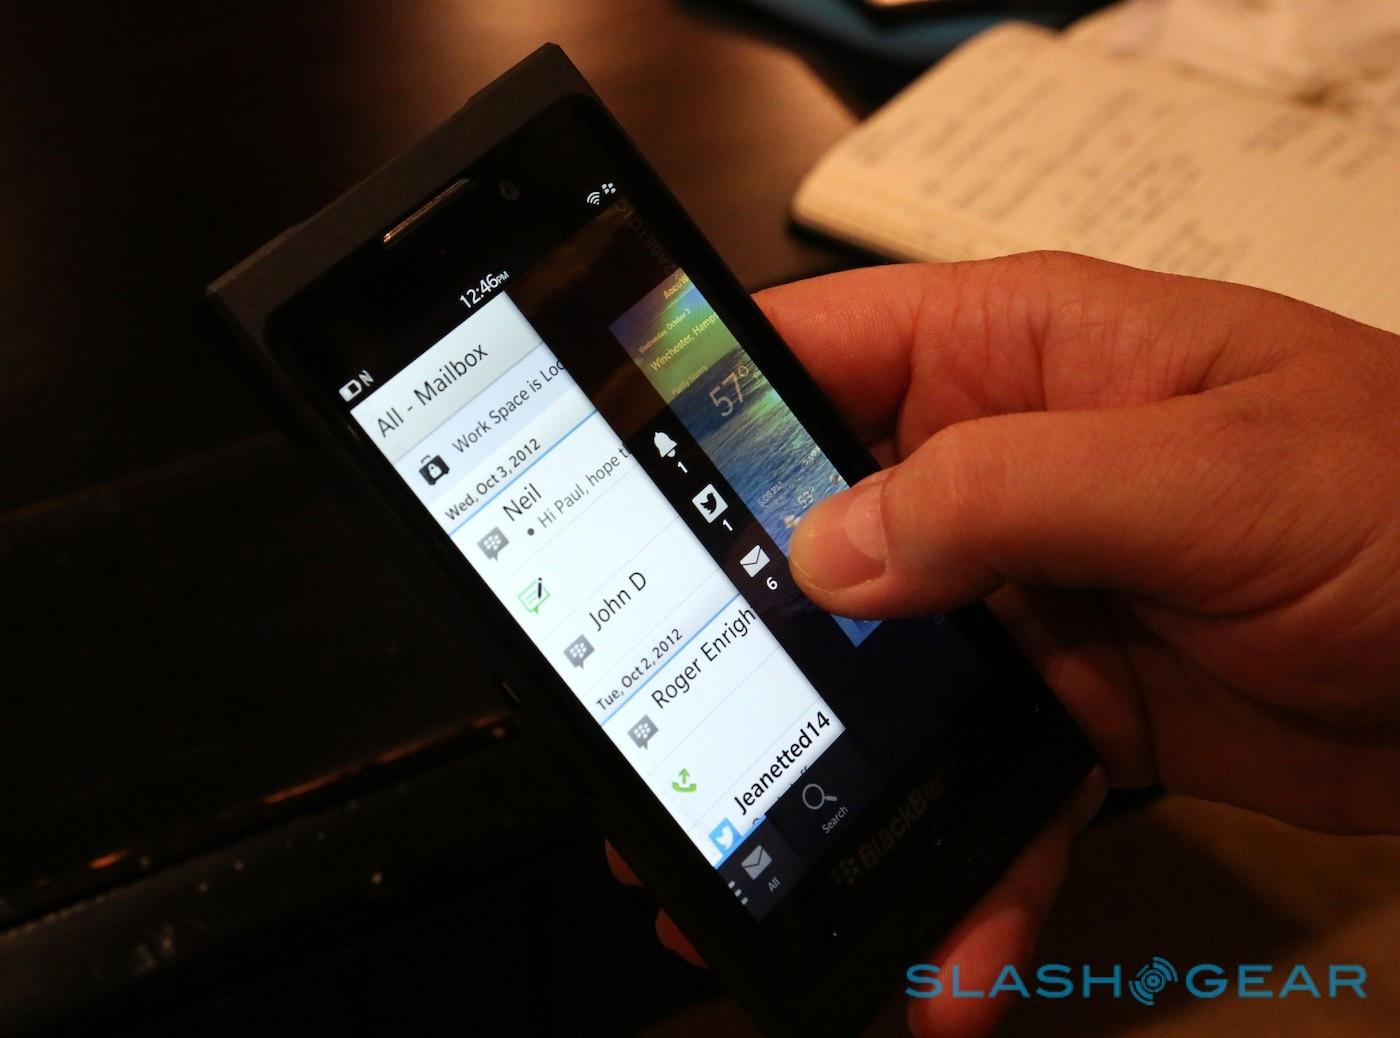 Updating the blackberry 10 dev alpha device software dating website for nerds